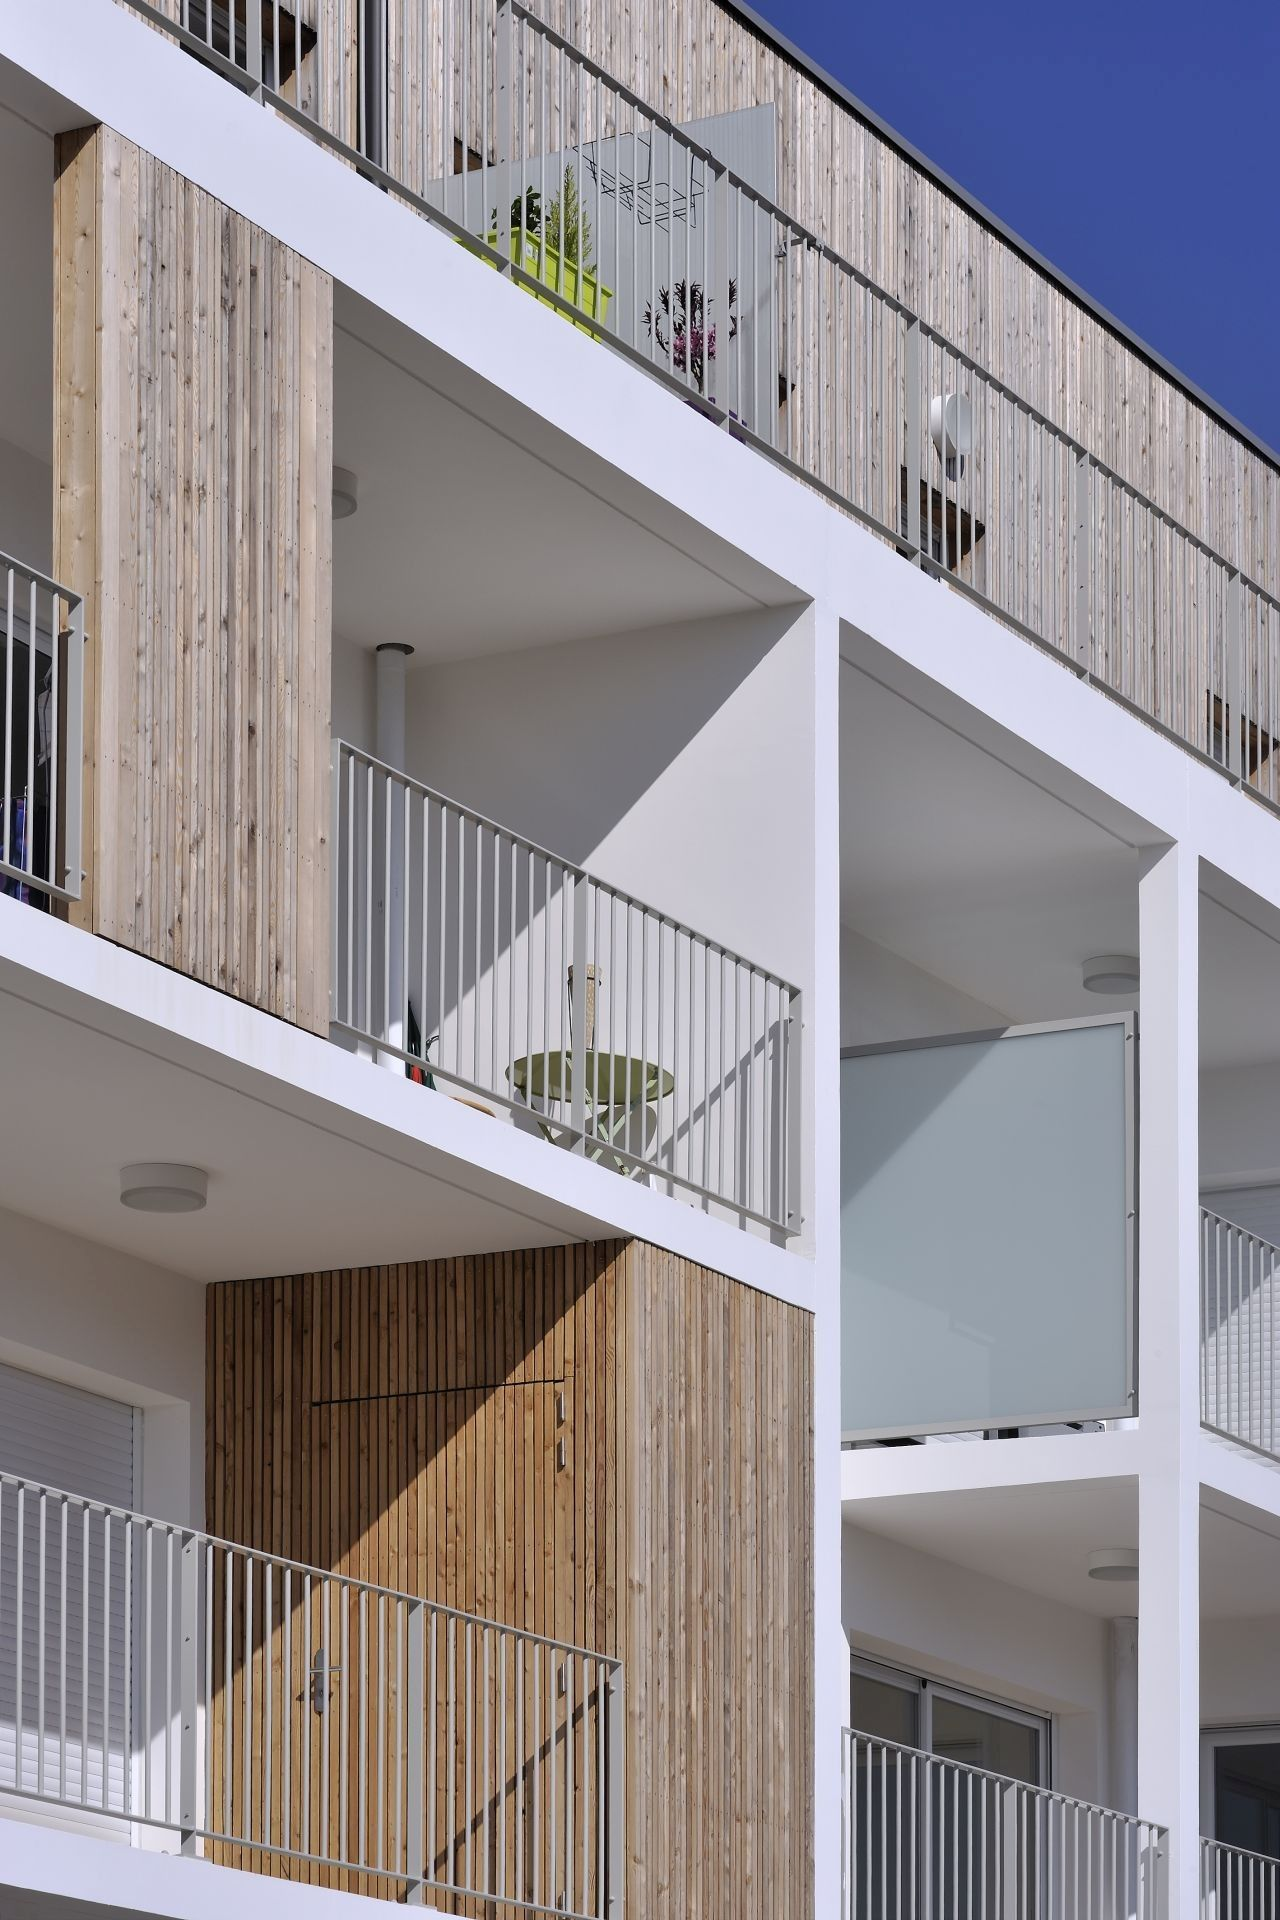 Esteban apartment complex by Leibar-Seigneurin Balcony